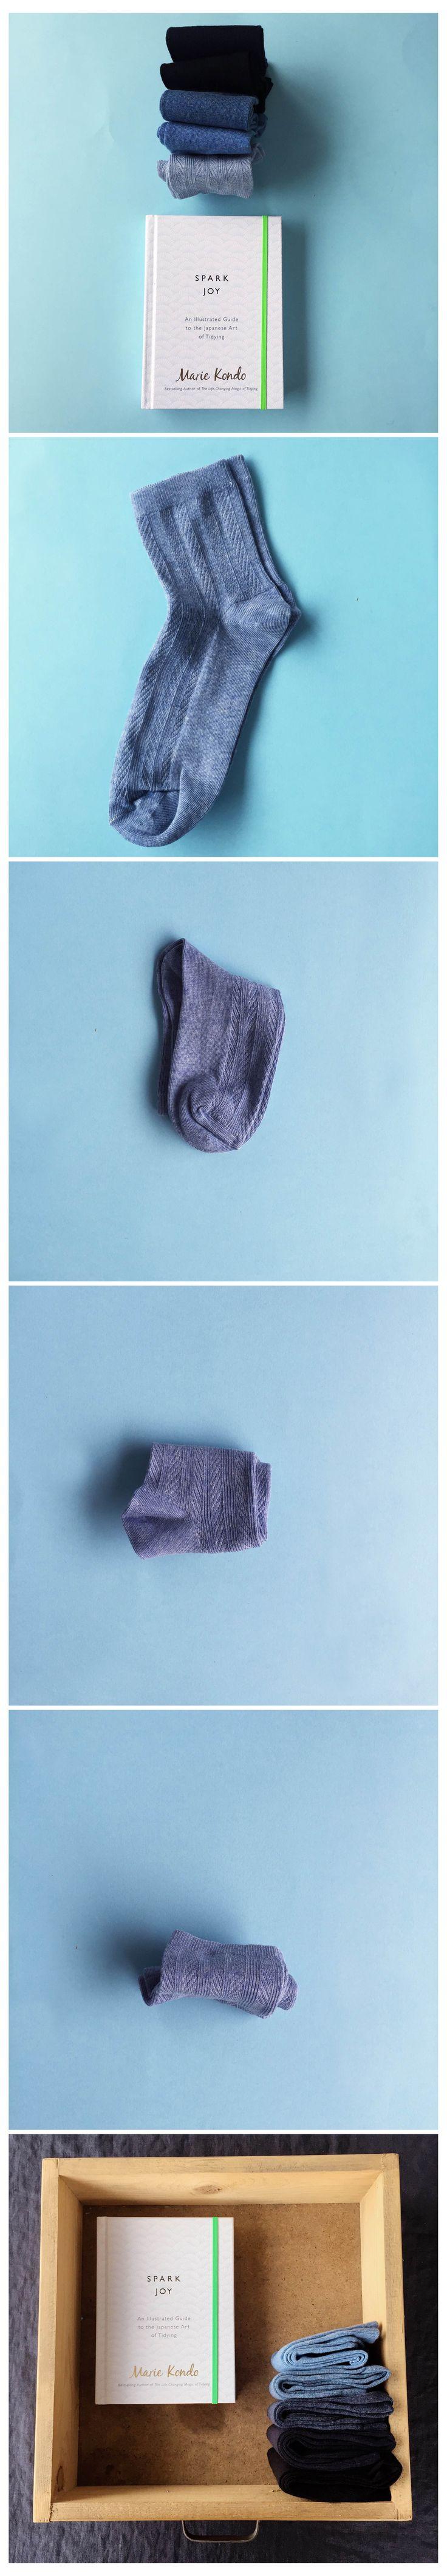 best 25 folding socks ideas on pinterest. Black Bedroom Furniture Sets. Home Design Ideas